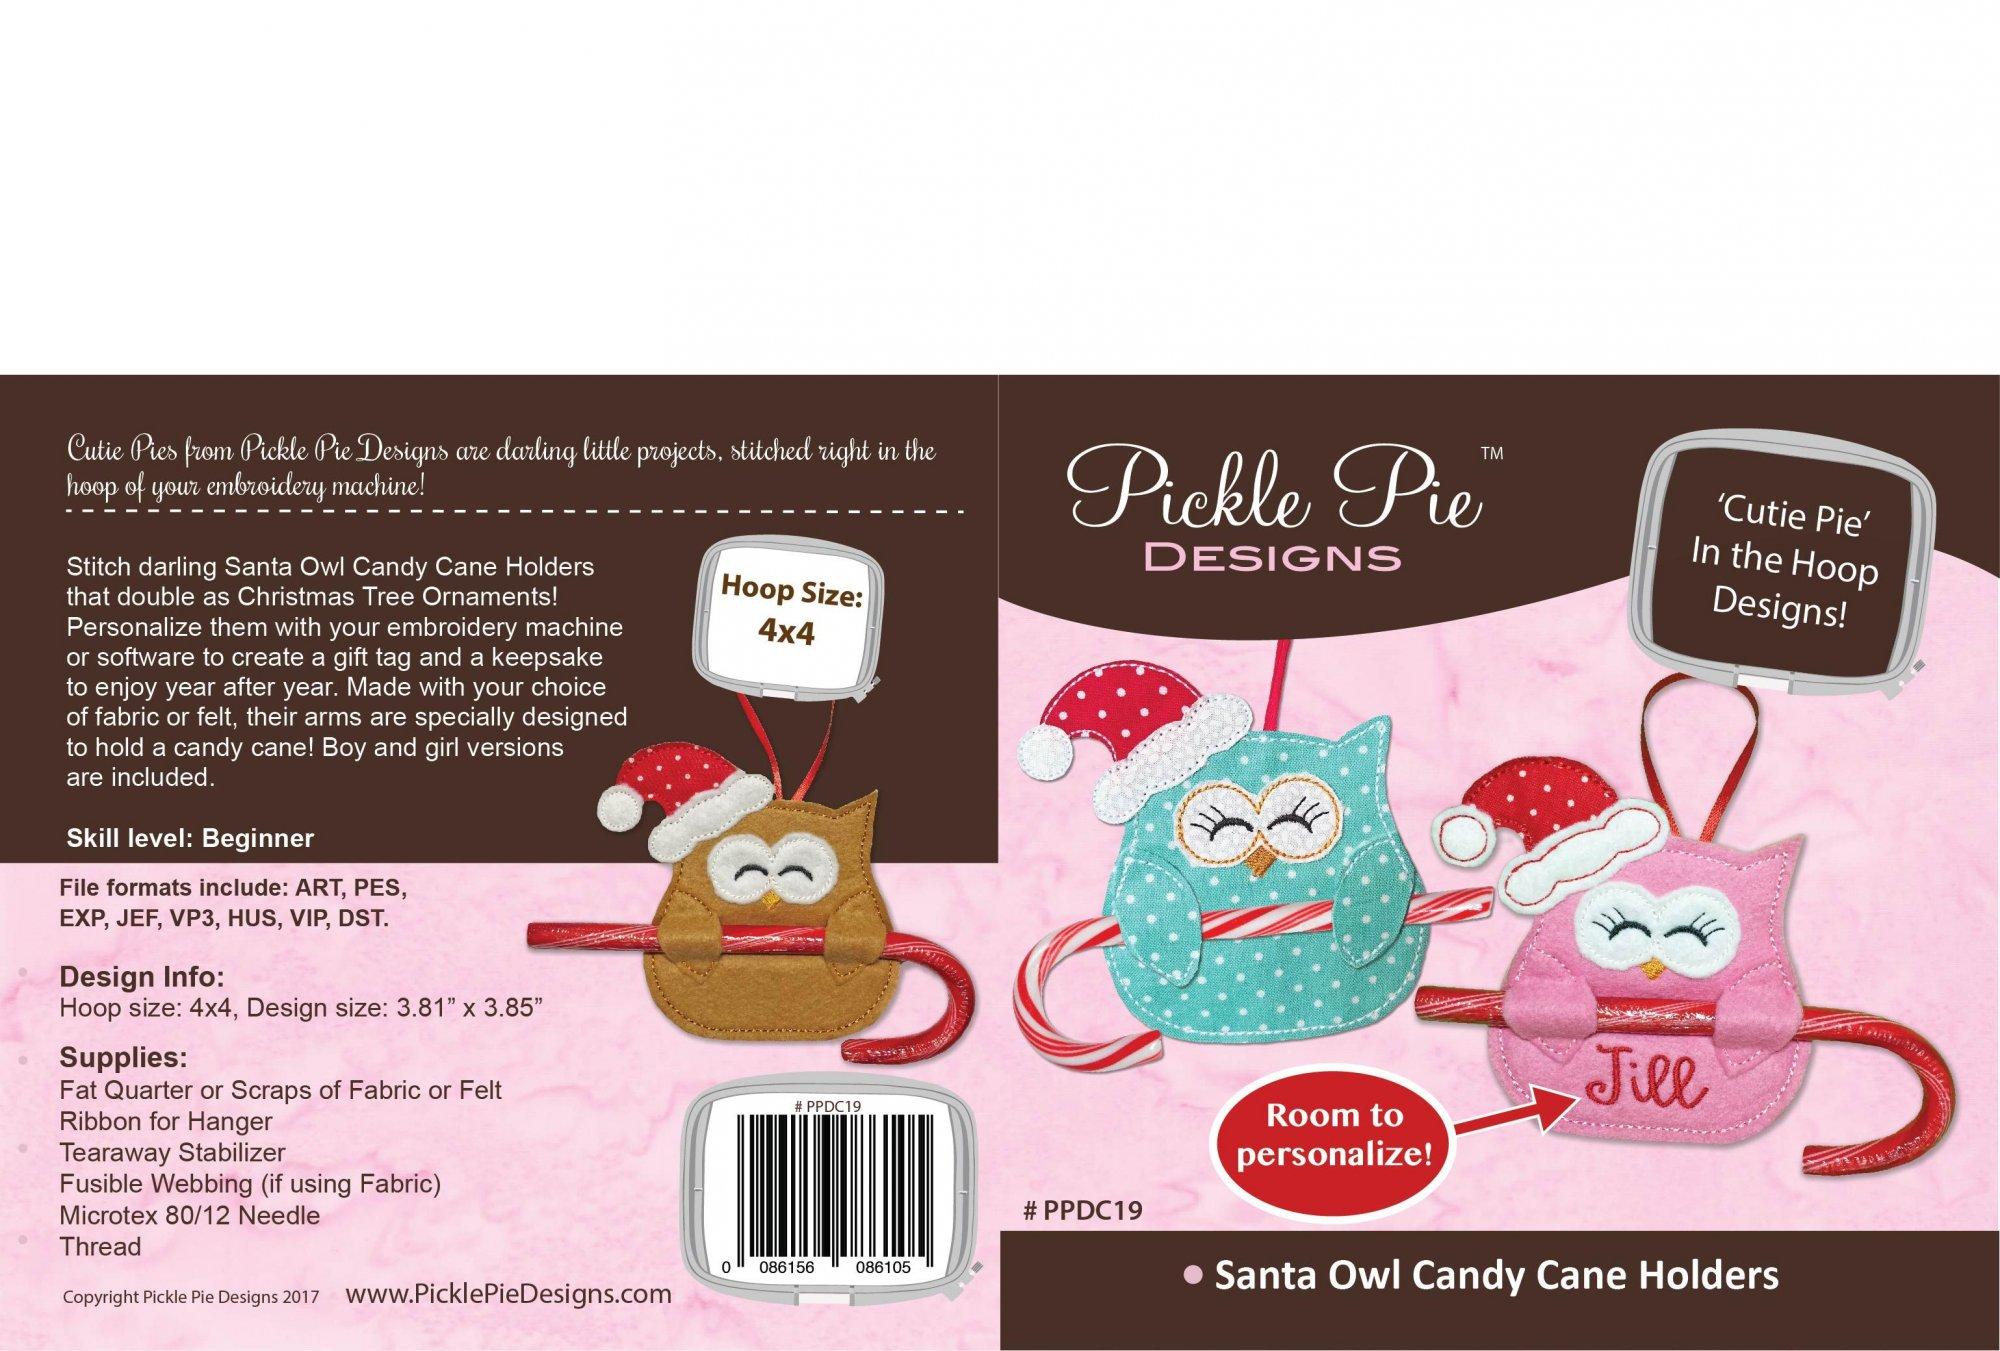 Santa Owl Candy Cane Holders